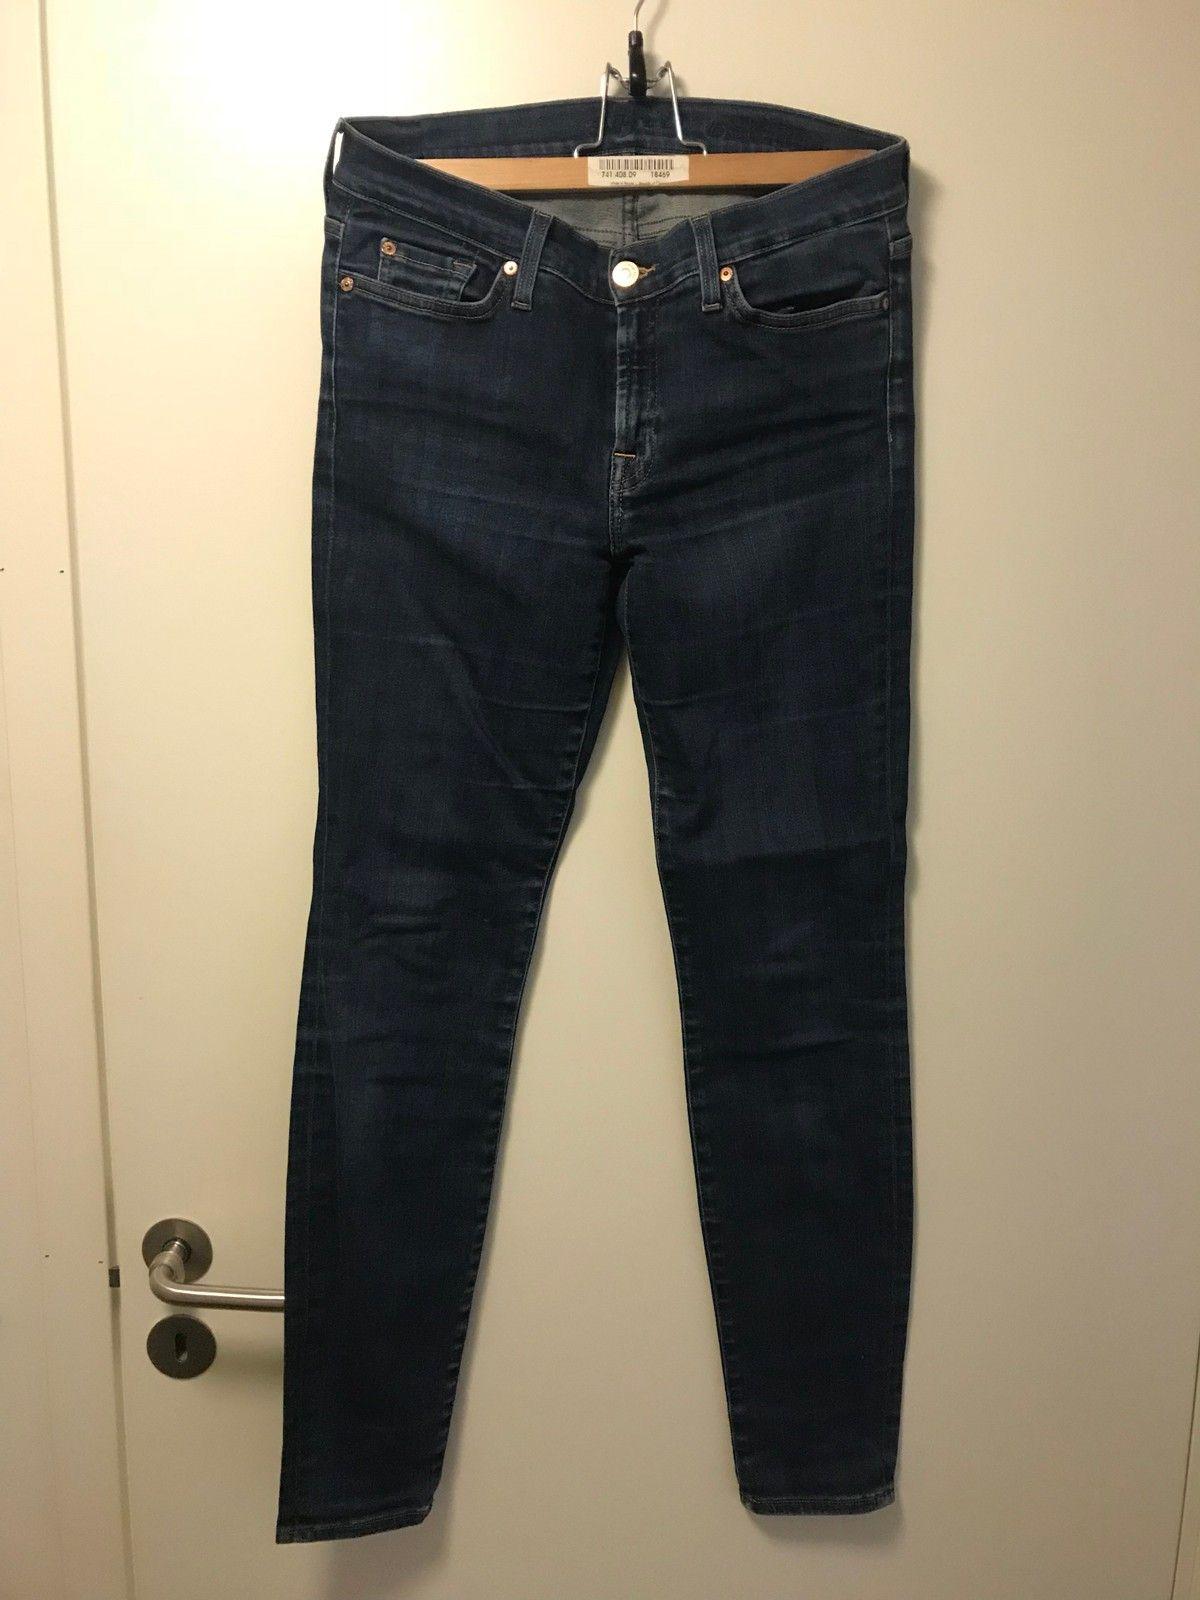 688a874b466 Original Seven for all mankind jeans - size 28 - dark blue - stretch ...